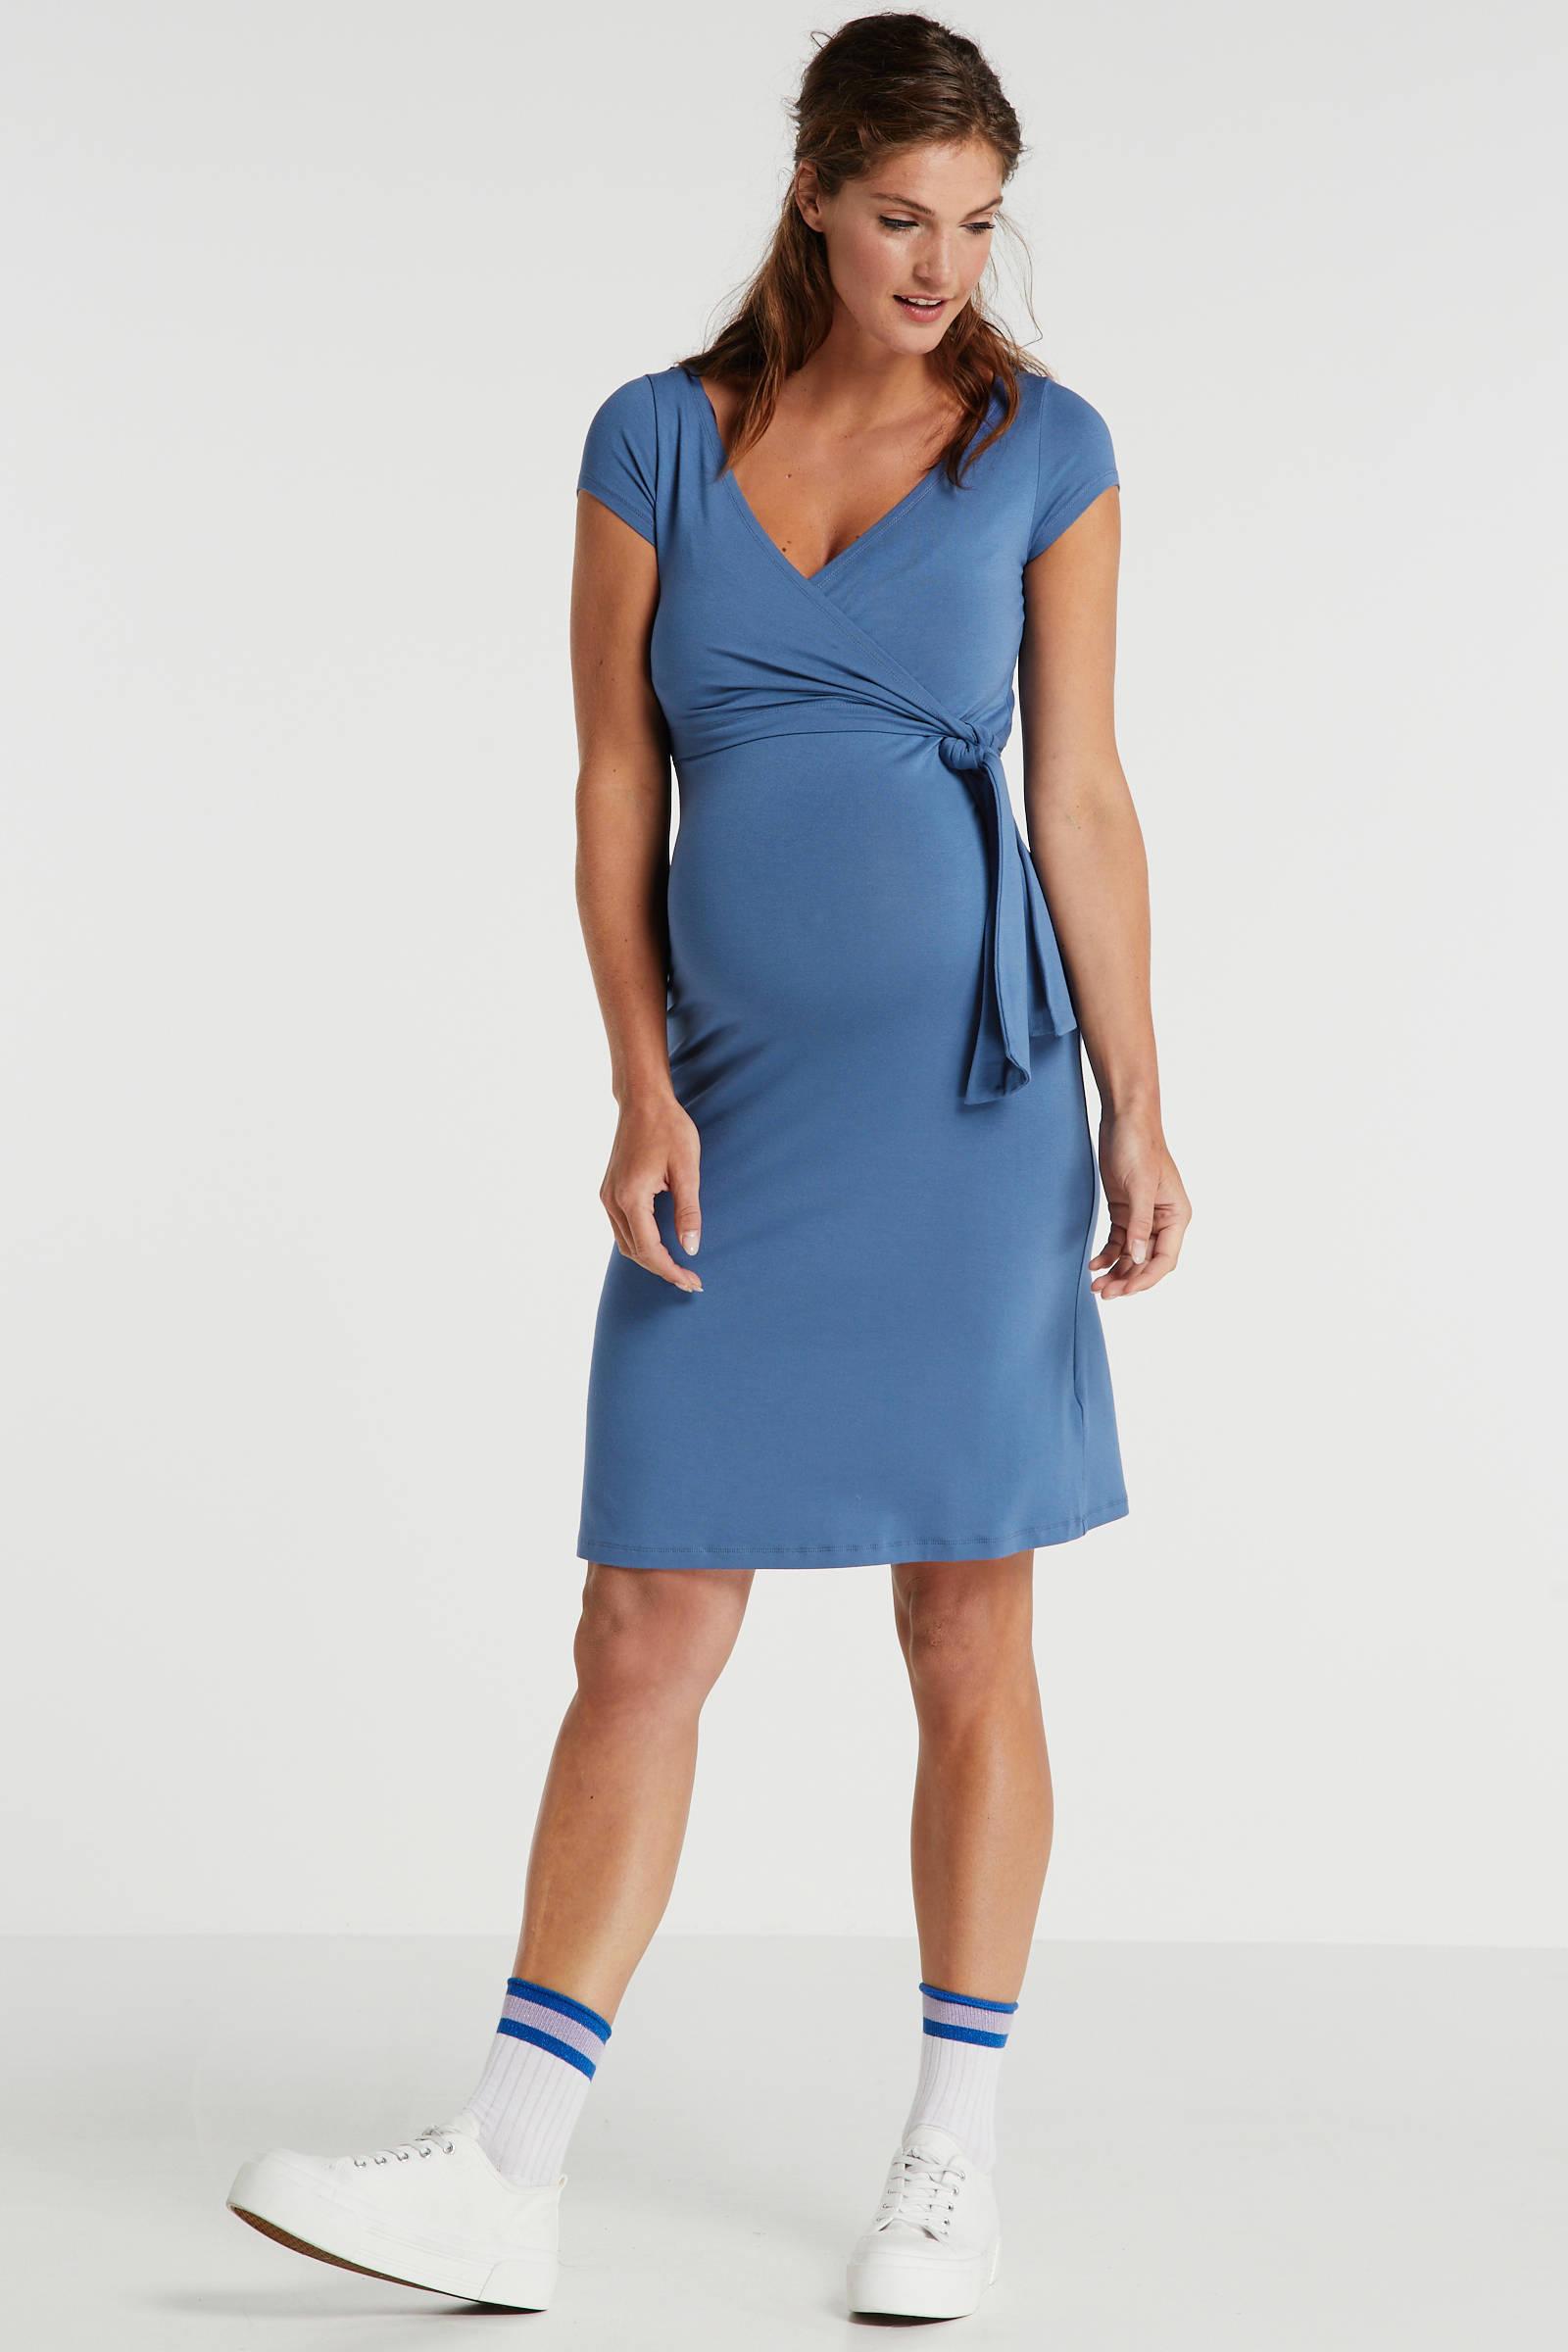 9Fashion zwangerschaps- en voedingsjurk Janisa blauw